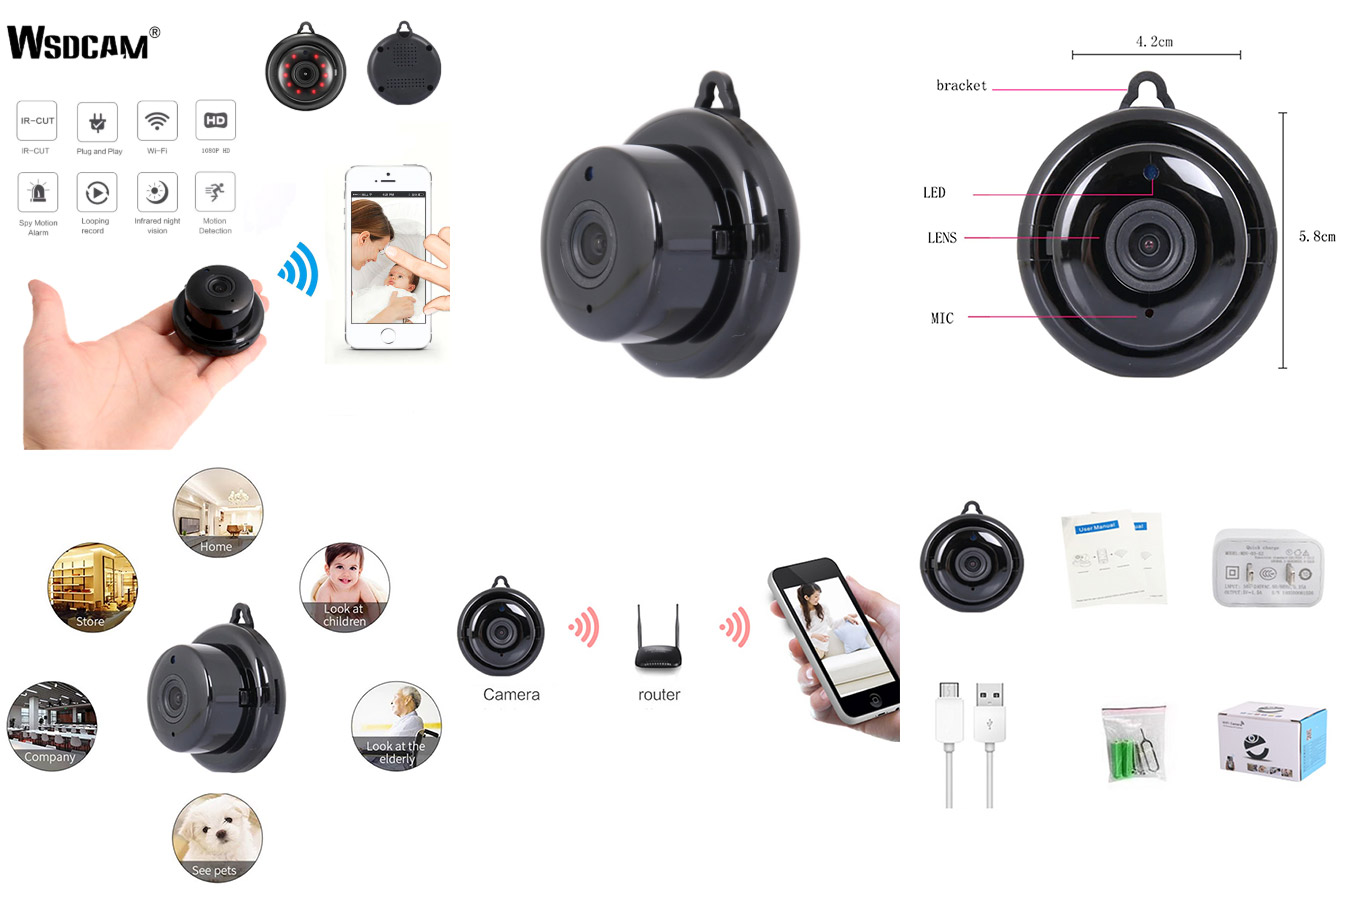 Качественная мини-камера wsdcam